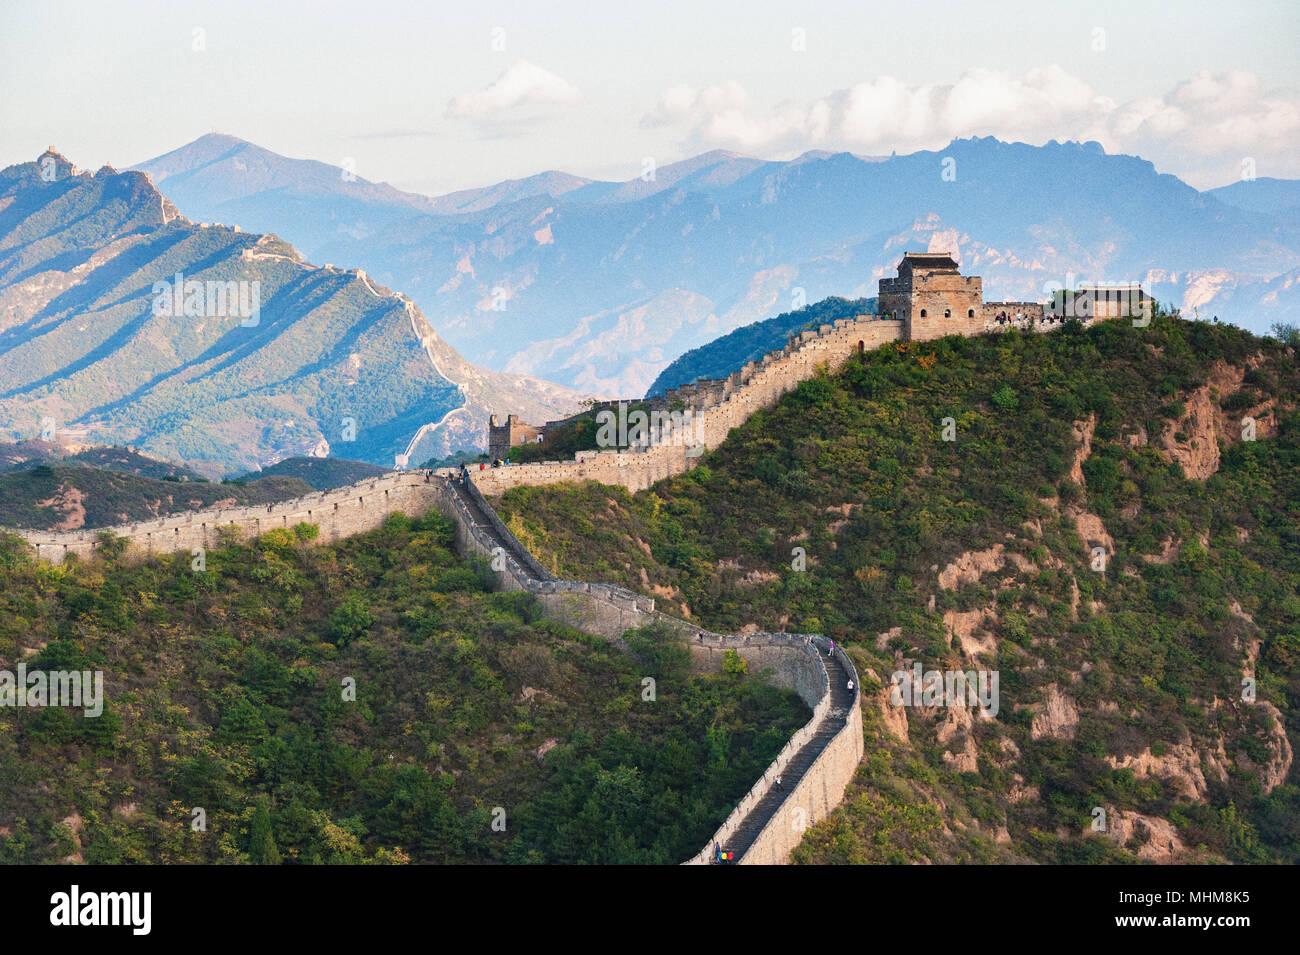 Jinshanling Great Wall, Provinz Hebei der Volksrepublik China Stockbild